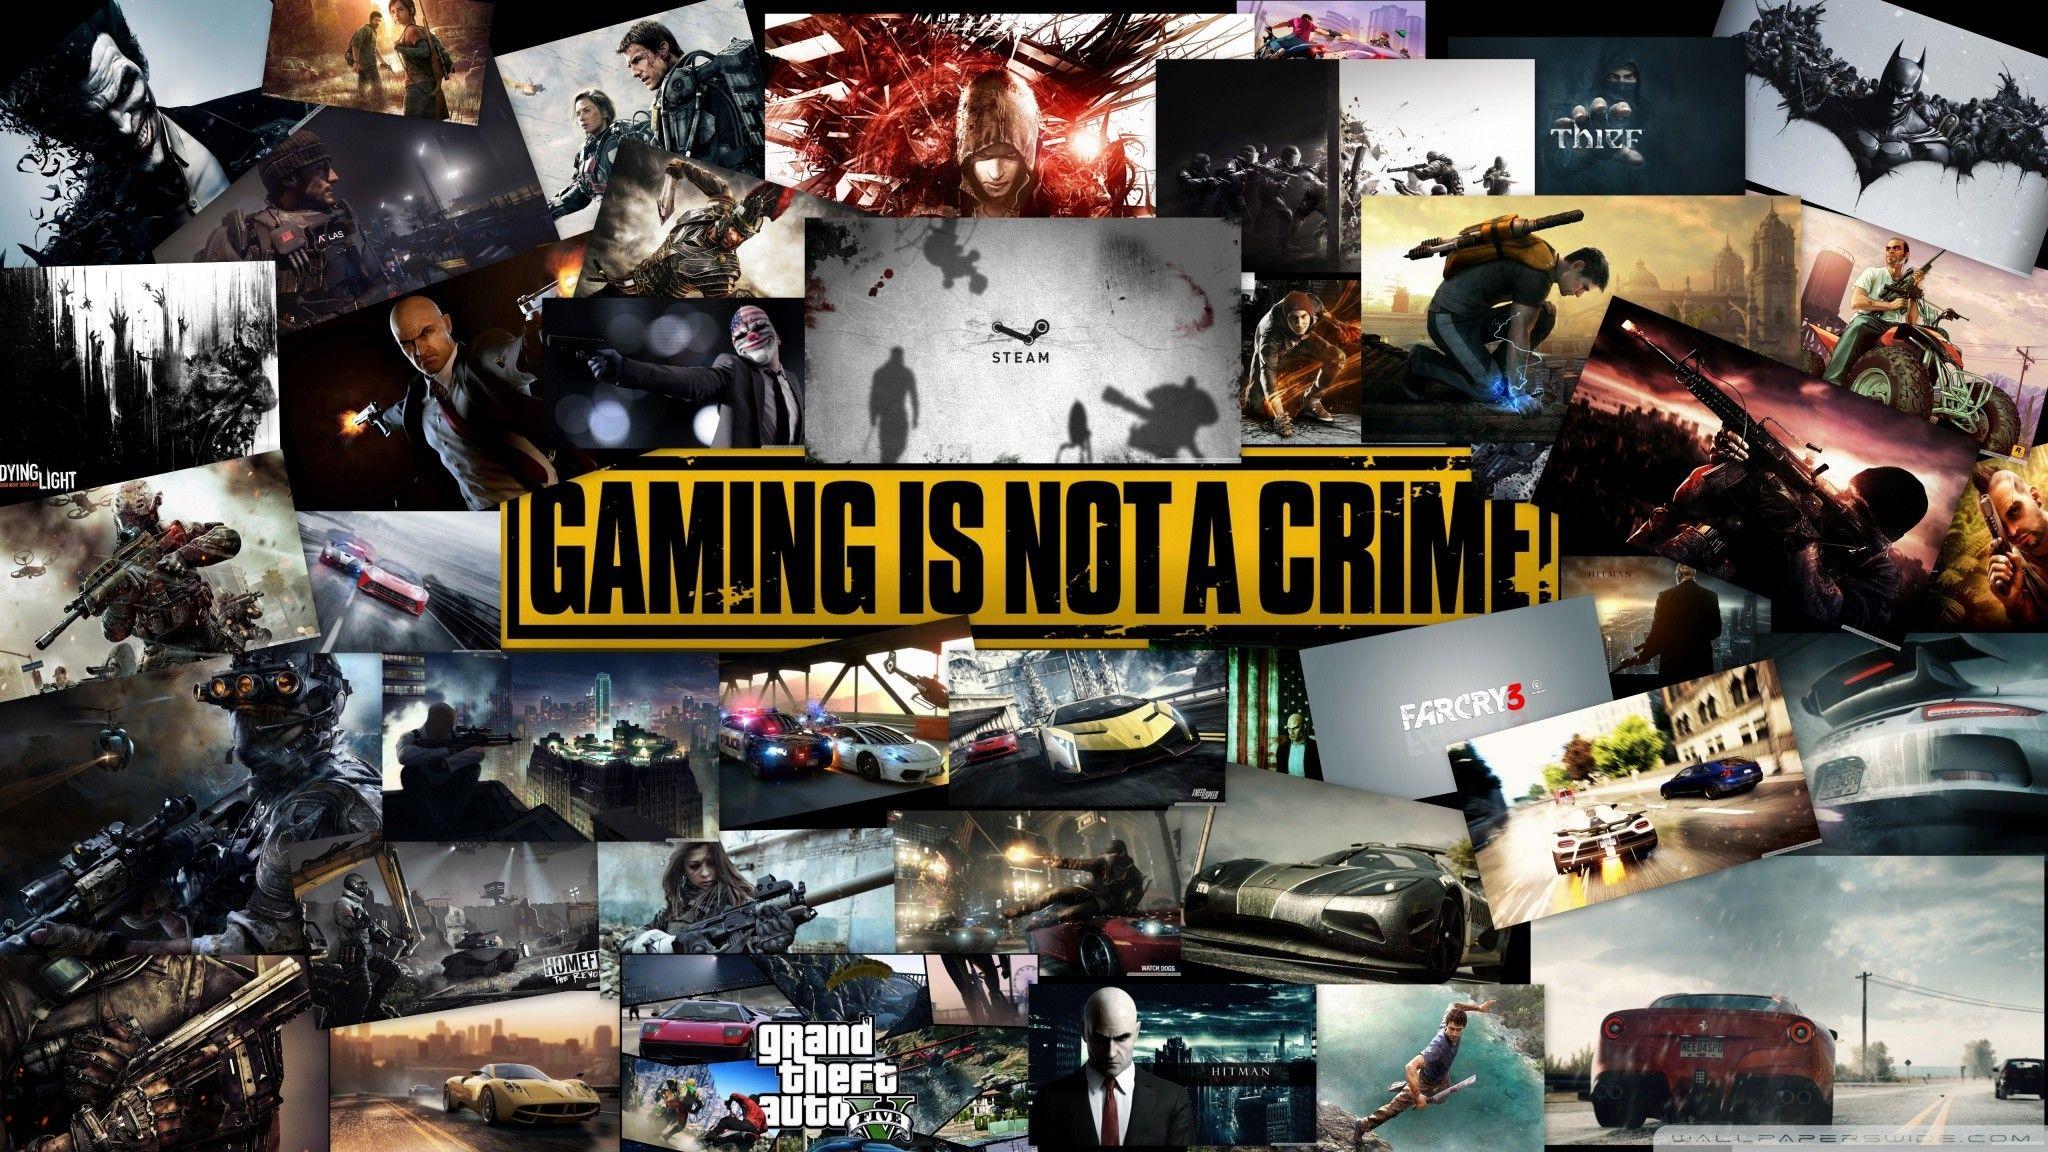 2048x1152 Gaming Wallpaper 90 Images In 2019 Gaming